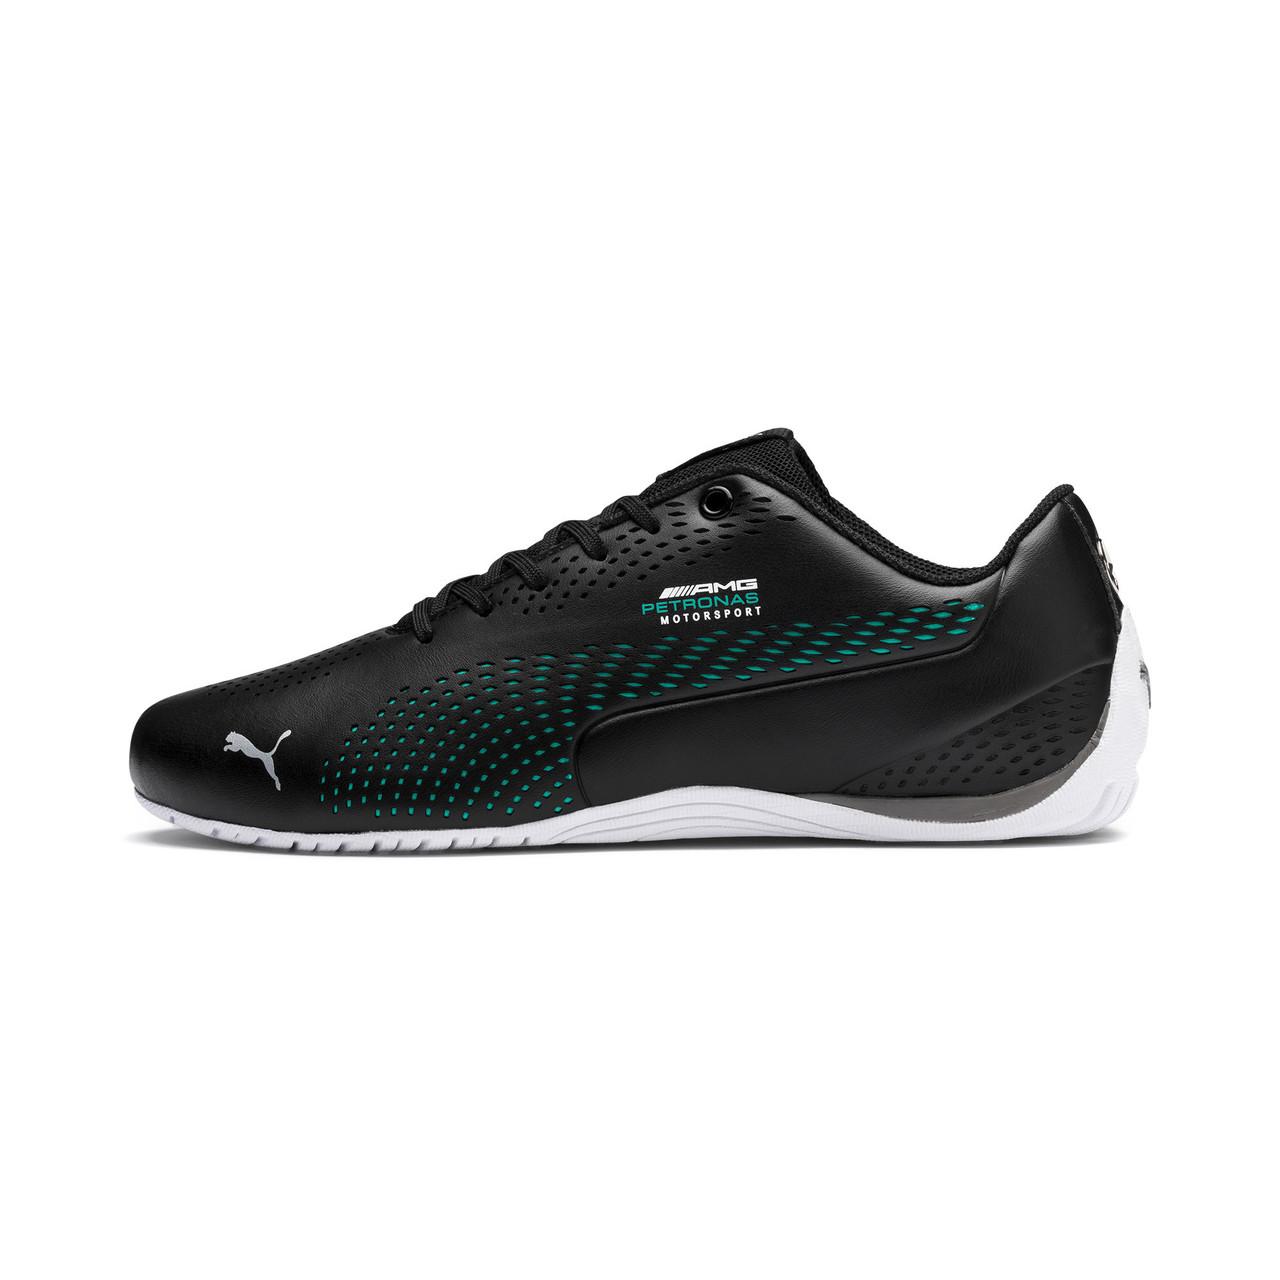 1dd3baaf Кроссовки спортивные мужские Mercedes AMG Petronas Drift Cat 5 Ultra II  Shoes